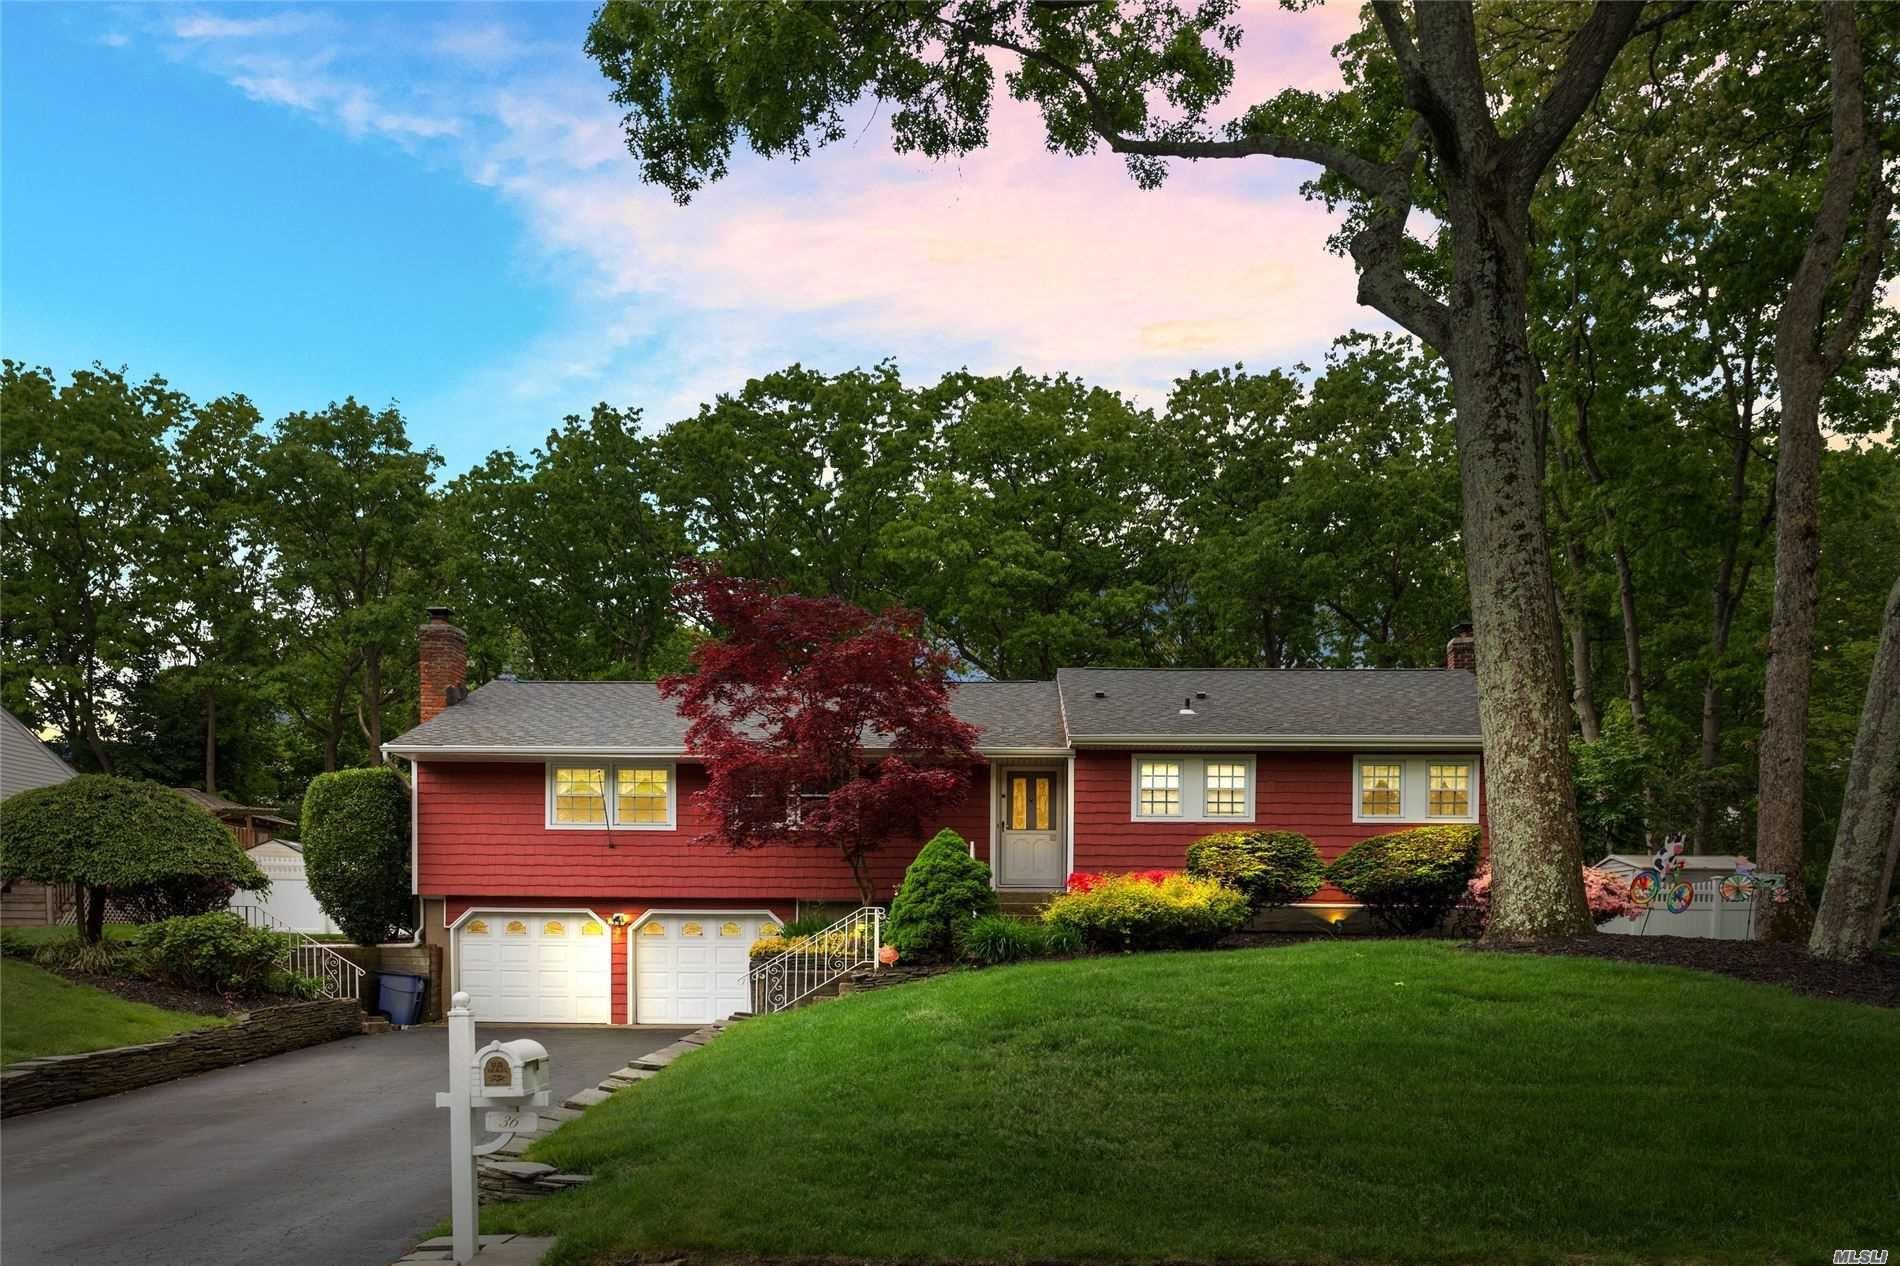 36 Sunflower Dr, Hauppauge, NY 11788 - MLS#: 3217100